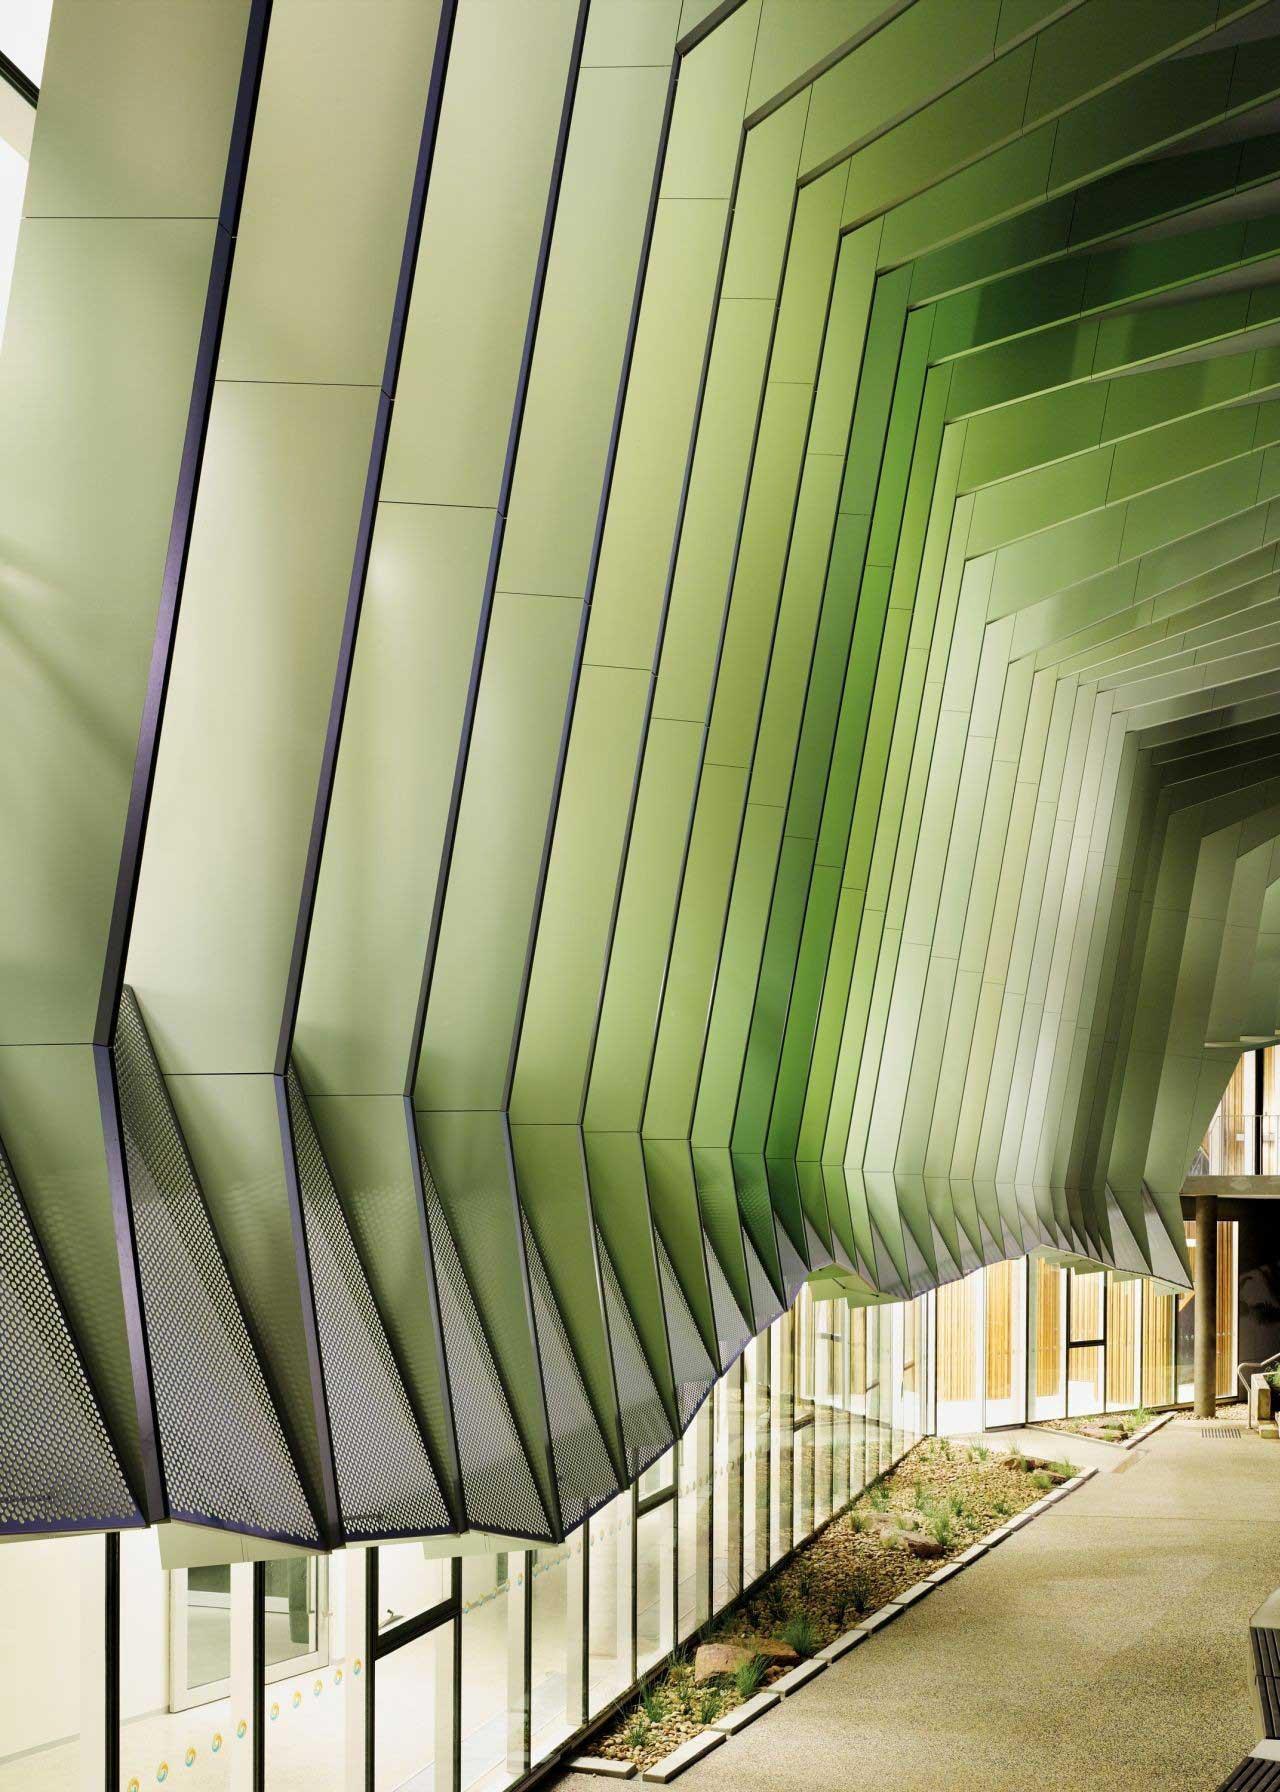 architecture aw raics innovation - HD1280×1792